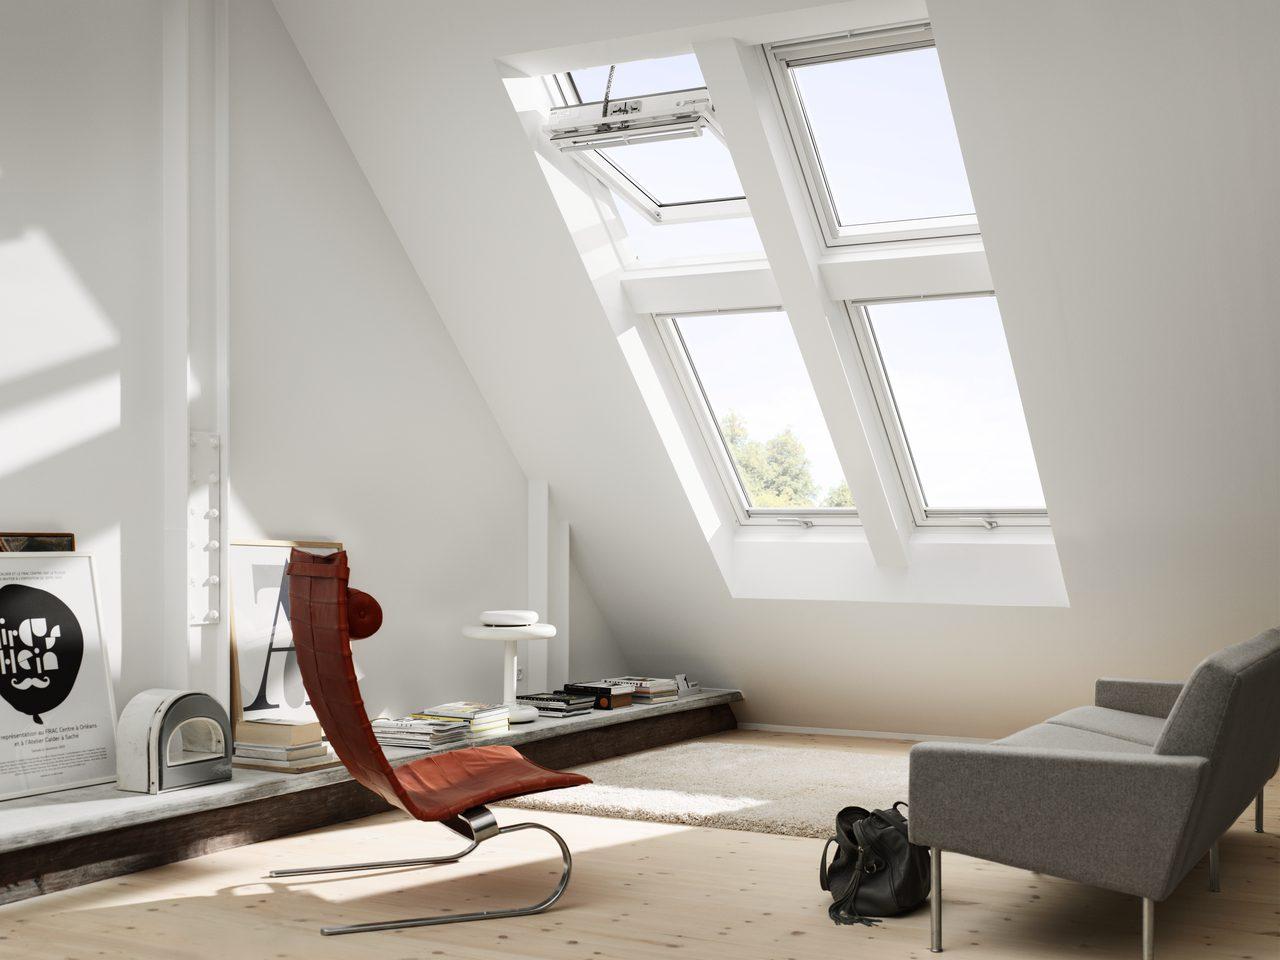 navrh okien, architekt